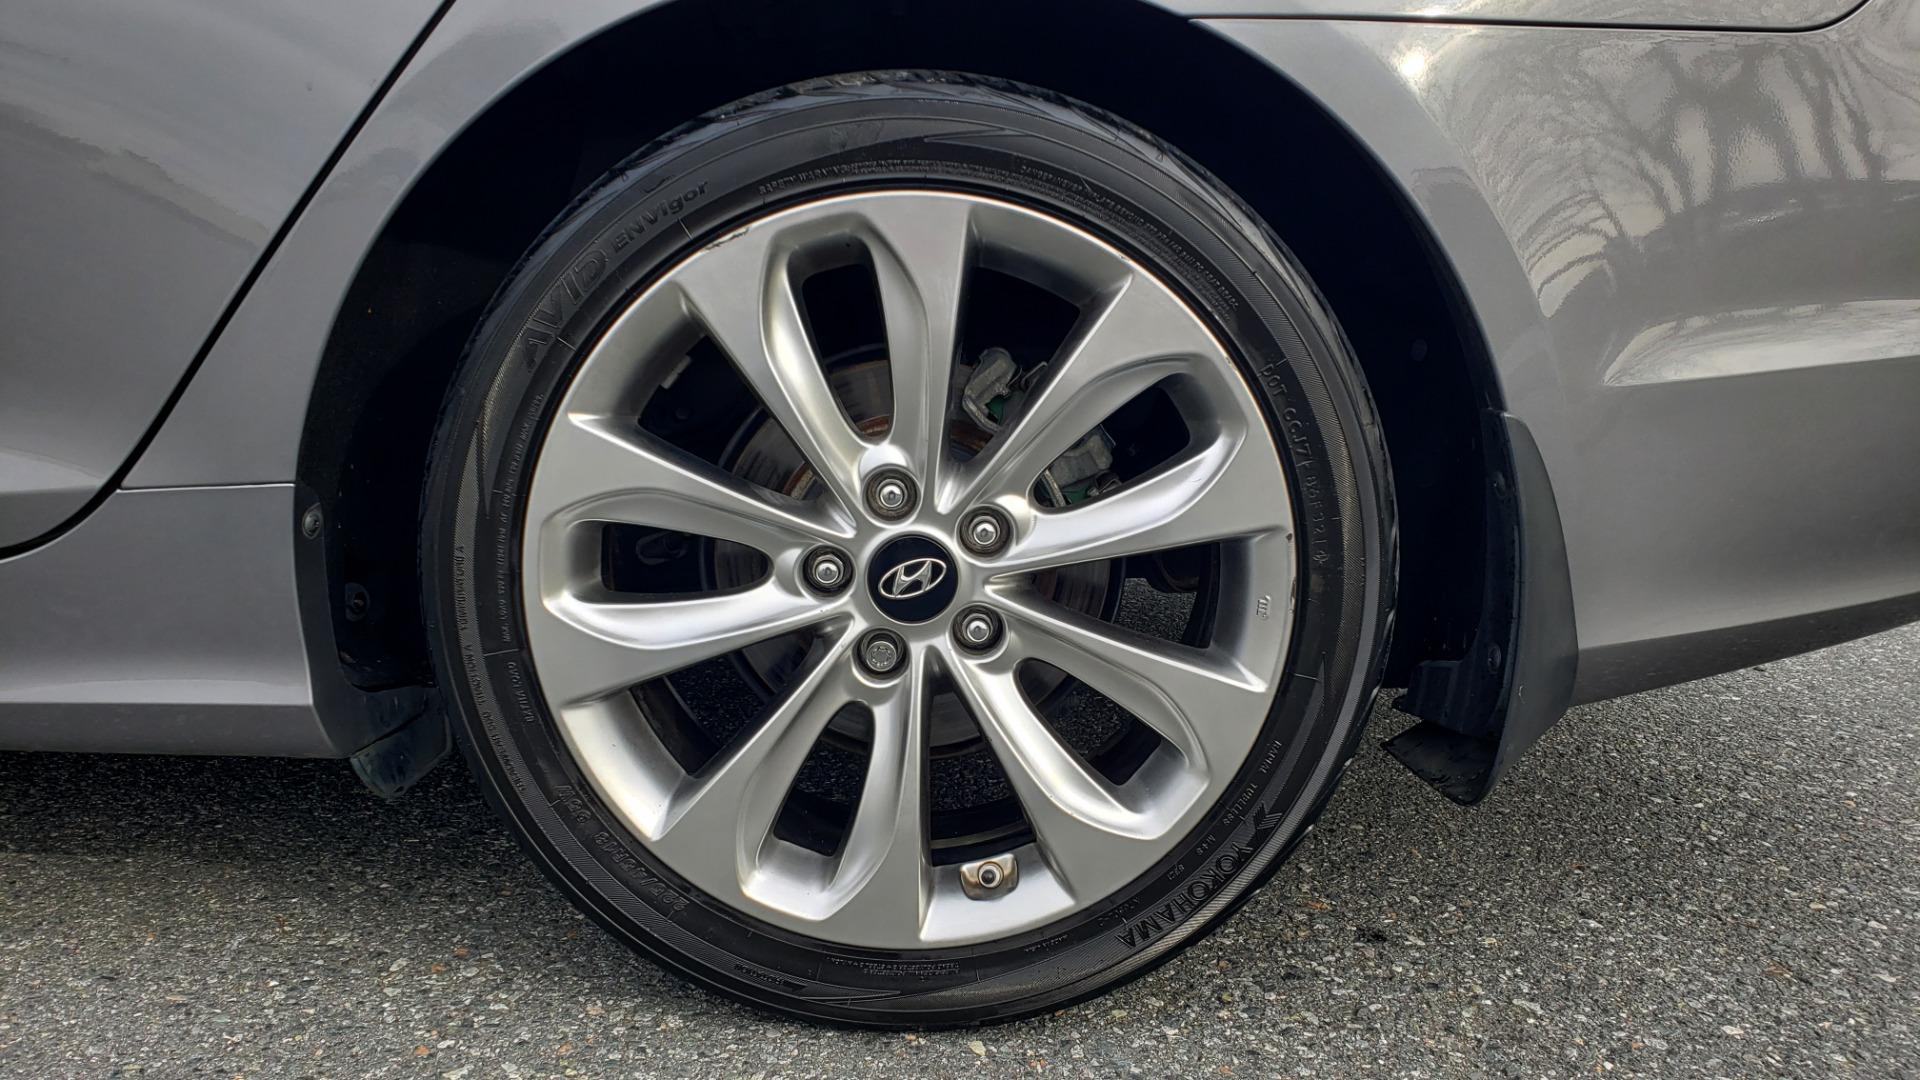 Used 2013 Hyundai SONATA SE AUTO / 2.4L 4-CYL / 6-SPD AUTO / VERY CLEAN for sale Sold at Formula Imports in Charlotte NC 28227 7